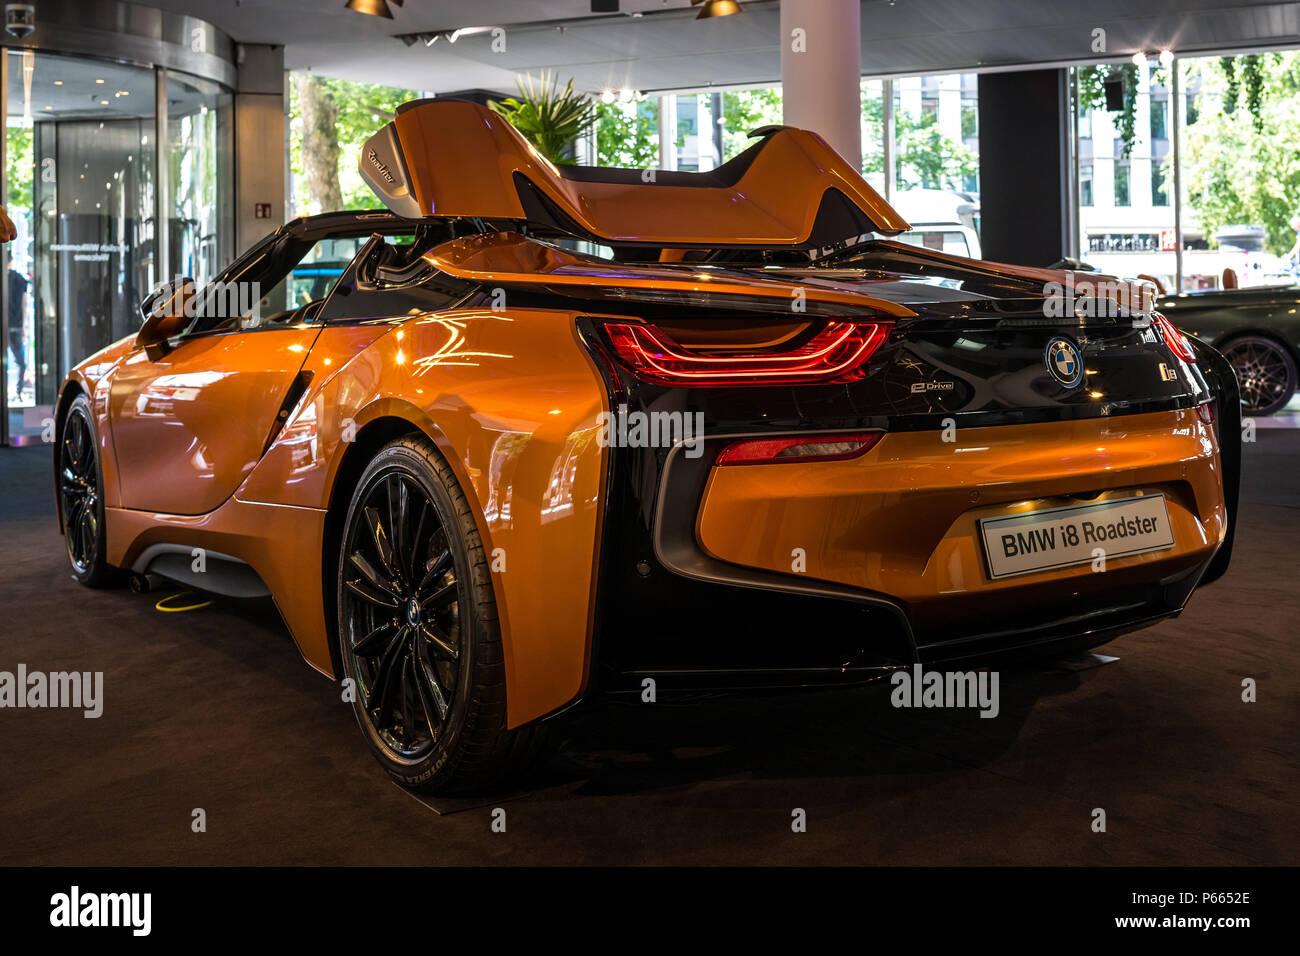 Berlin June 09 2018 Showroom A Plug In Hybrid Sports Car Bmw I8